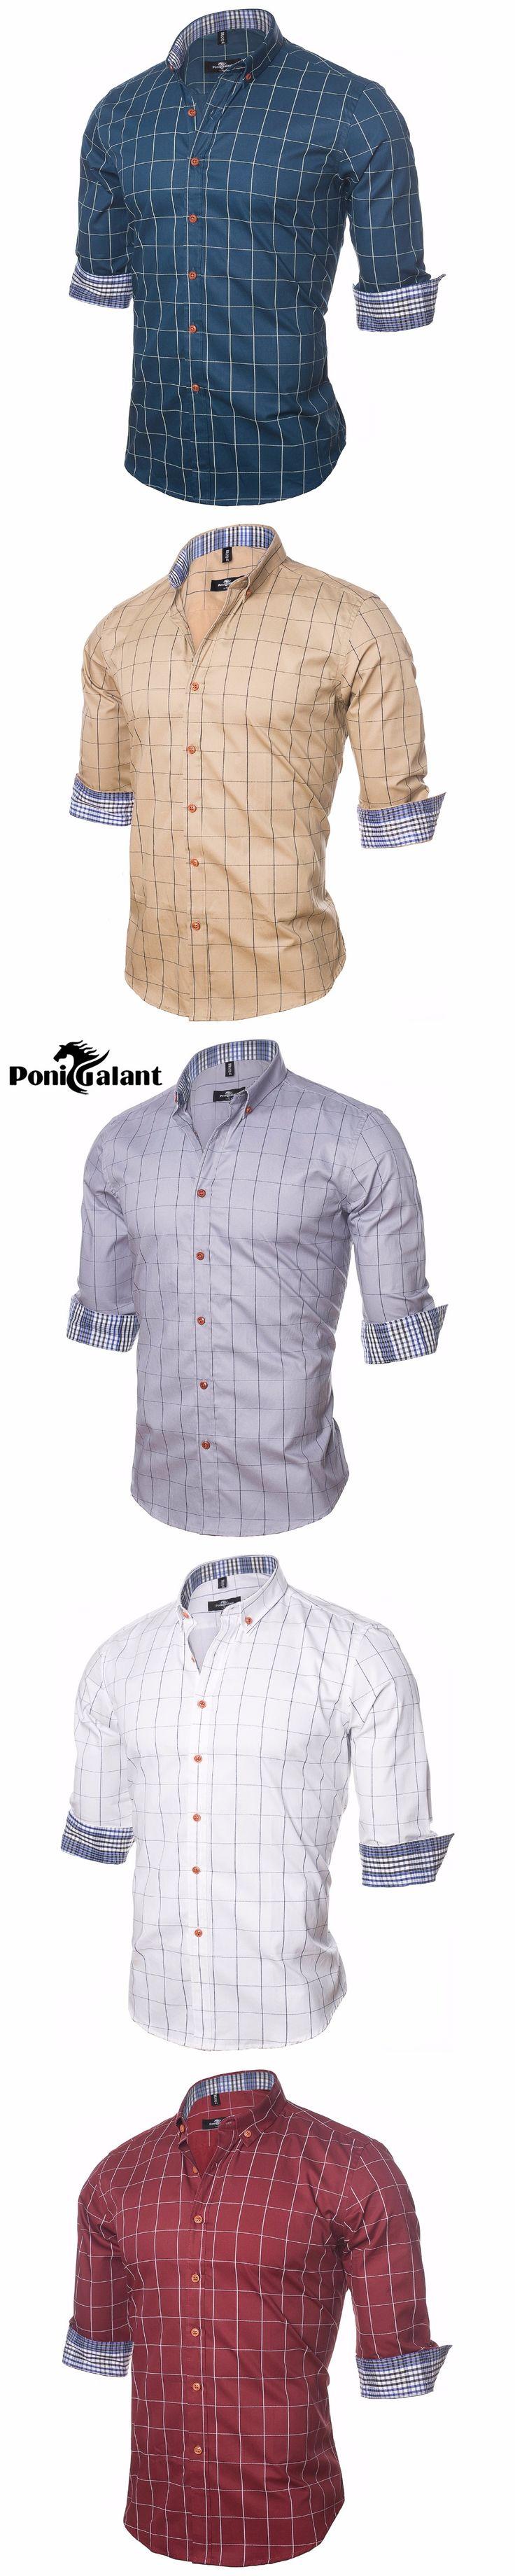 PoniGalant Brand Clothing 100% Cotton Plaid Shirt Men High Quality Mens Business Dress Shirt Men Camisa Social Asian Size M-5XL